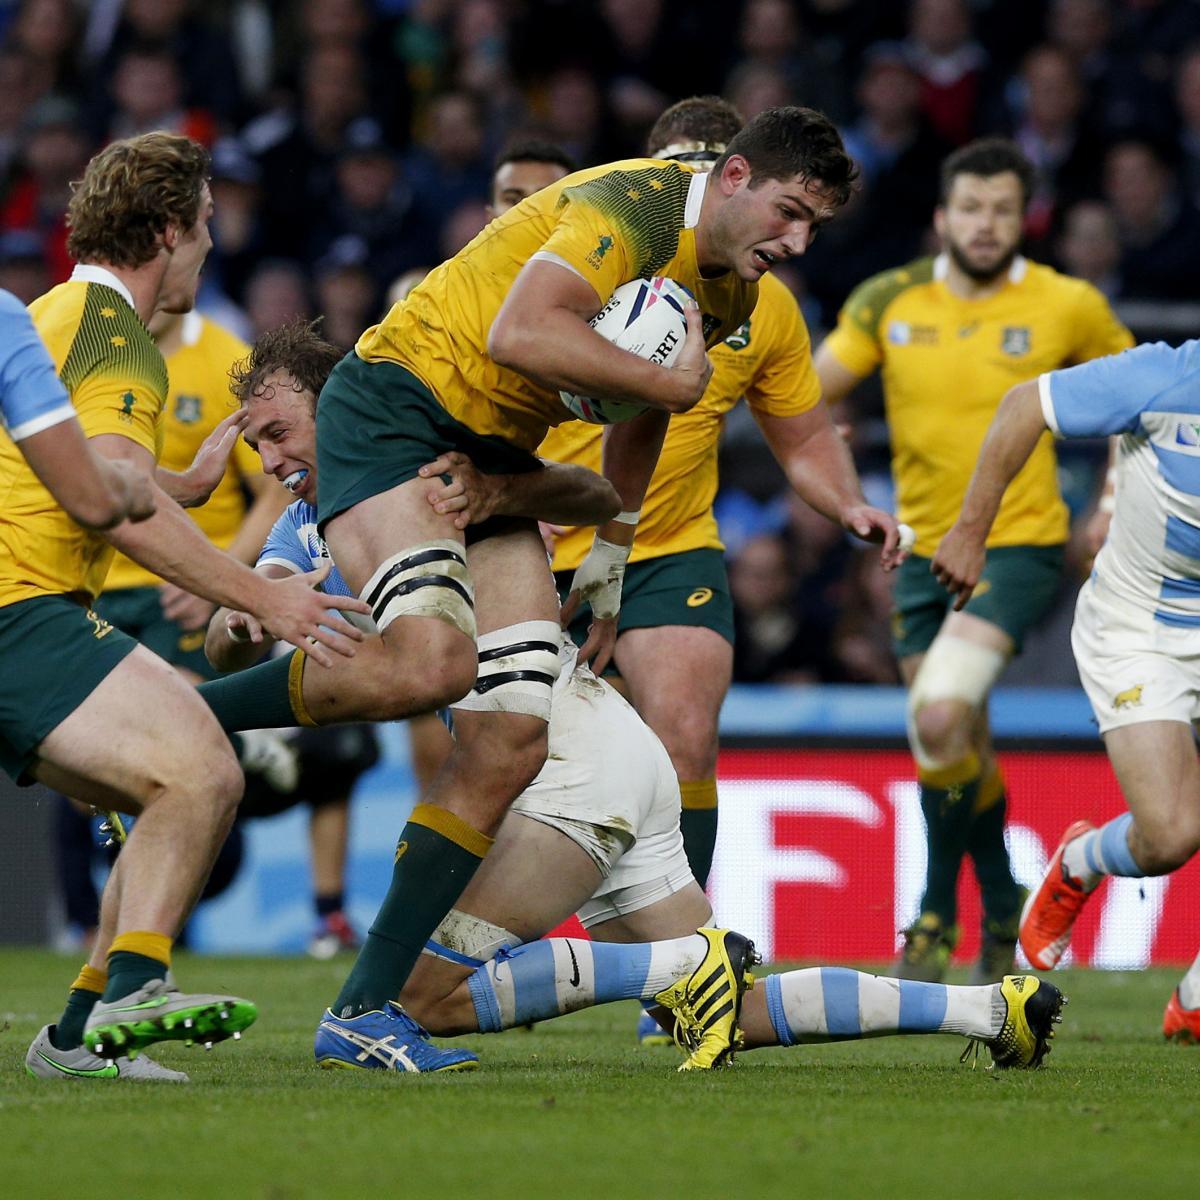 Scotland V Australia World Rugby: Argentina Vs. Australia: Score, Reaction From Rugby World